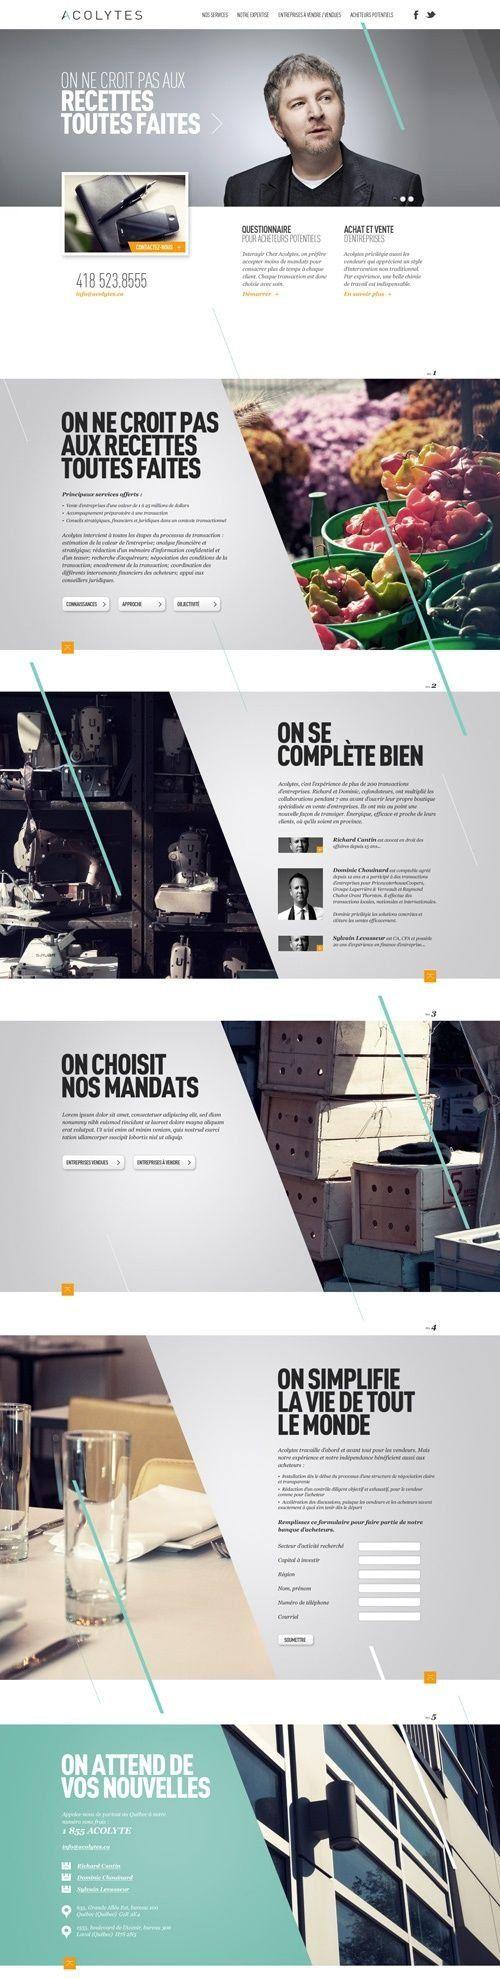 Web Design Acolytes By Alexandre Desjardins Via Behance In Layout